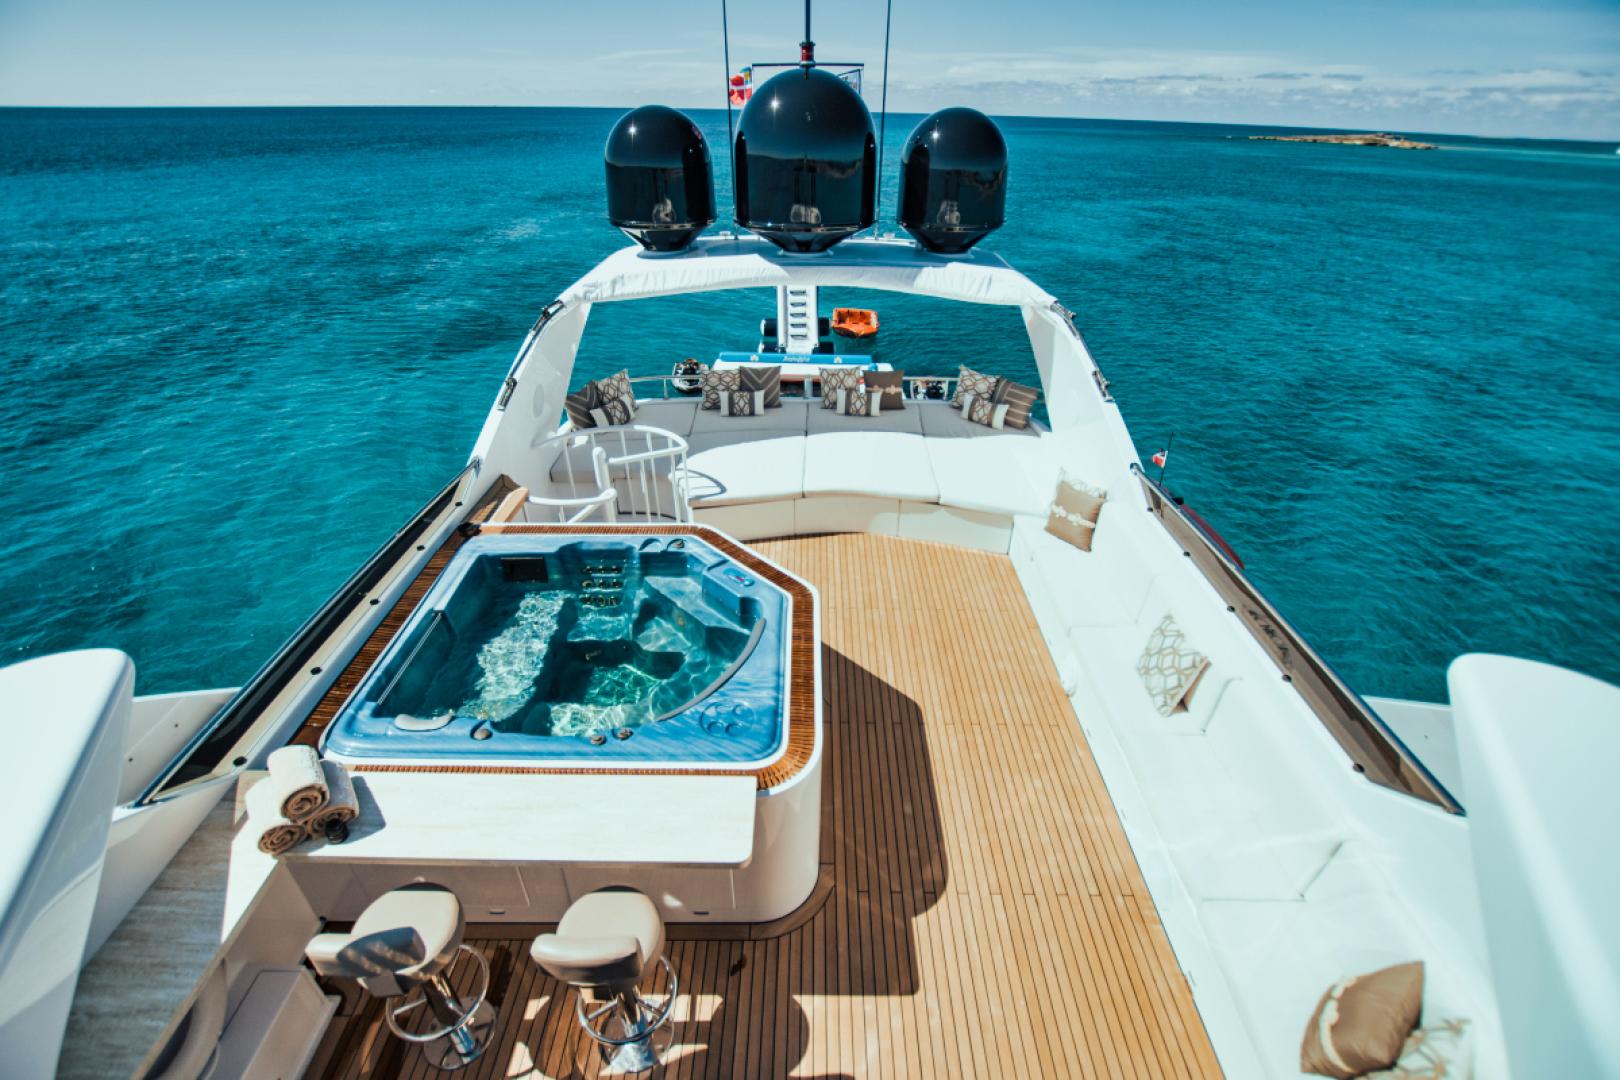 Motor Yacht-Norship 1994-Impulsive Fort Lauderdale-Florida-United States-1562577 | Thumbnail